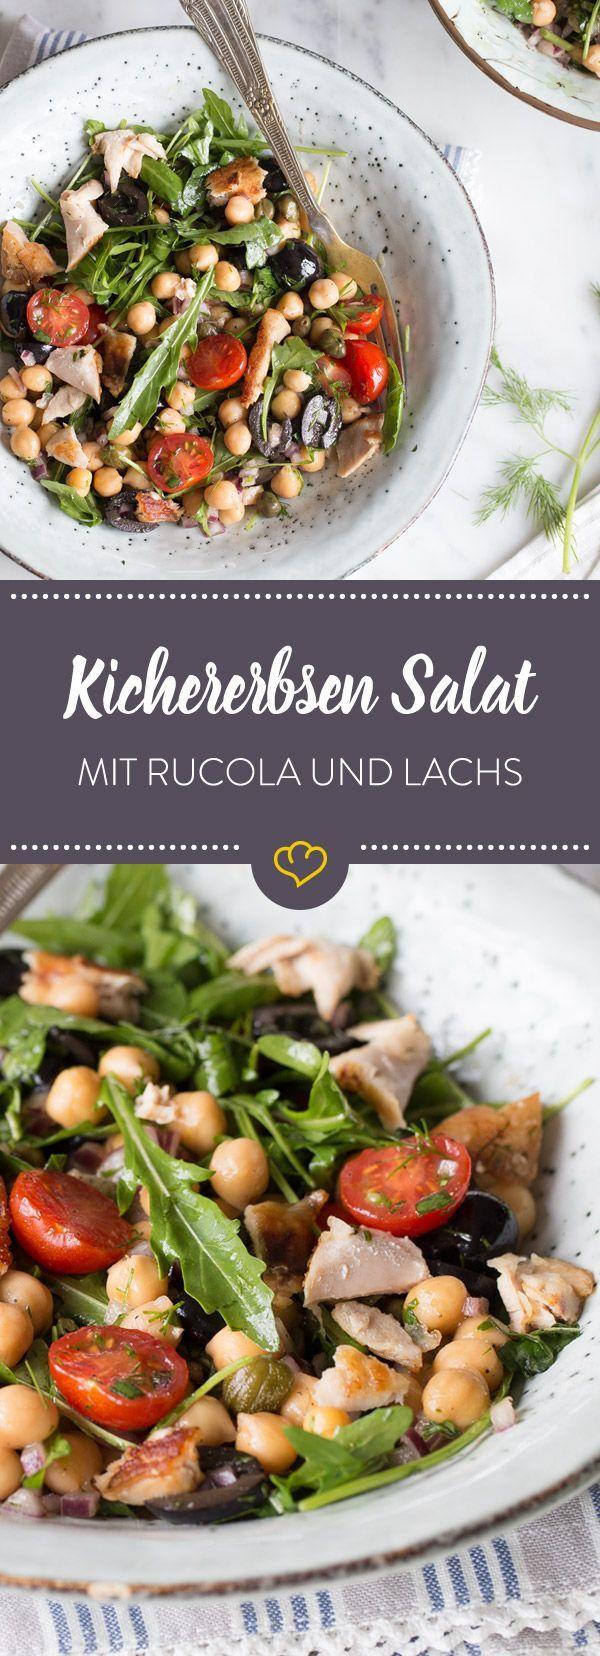 Salat zum abnehmen am abend